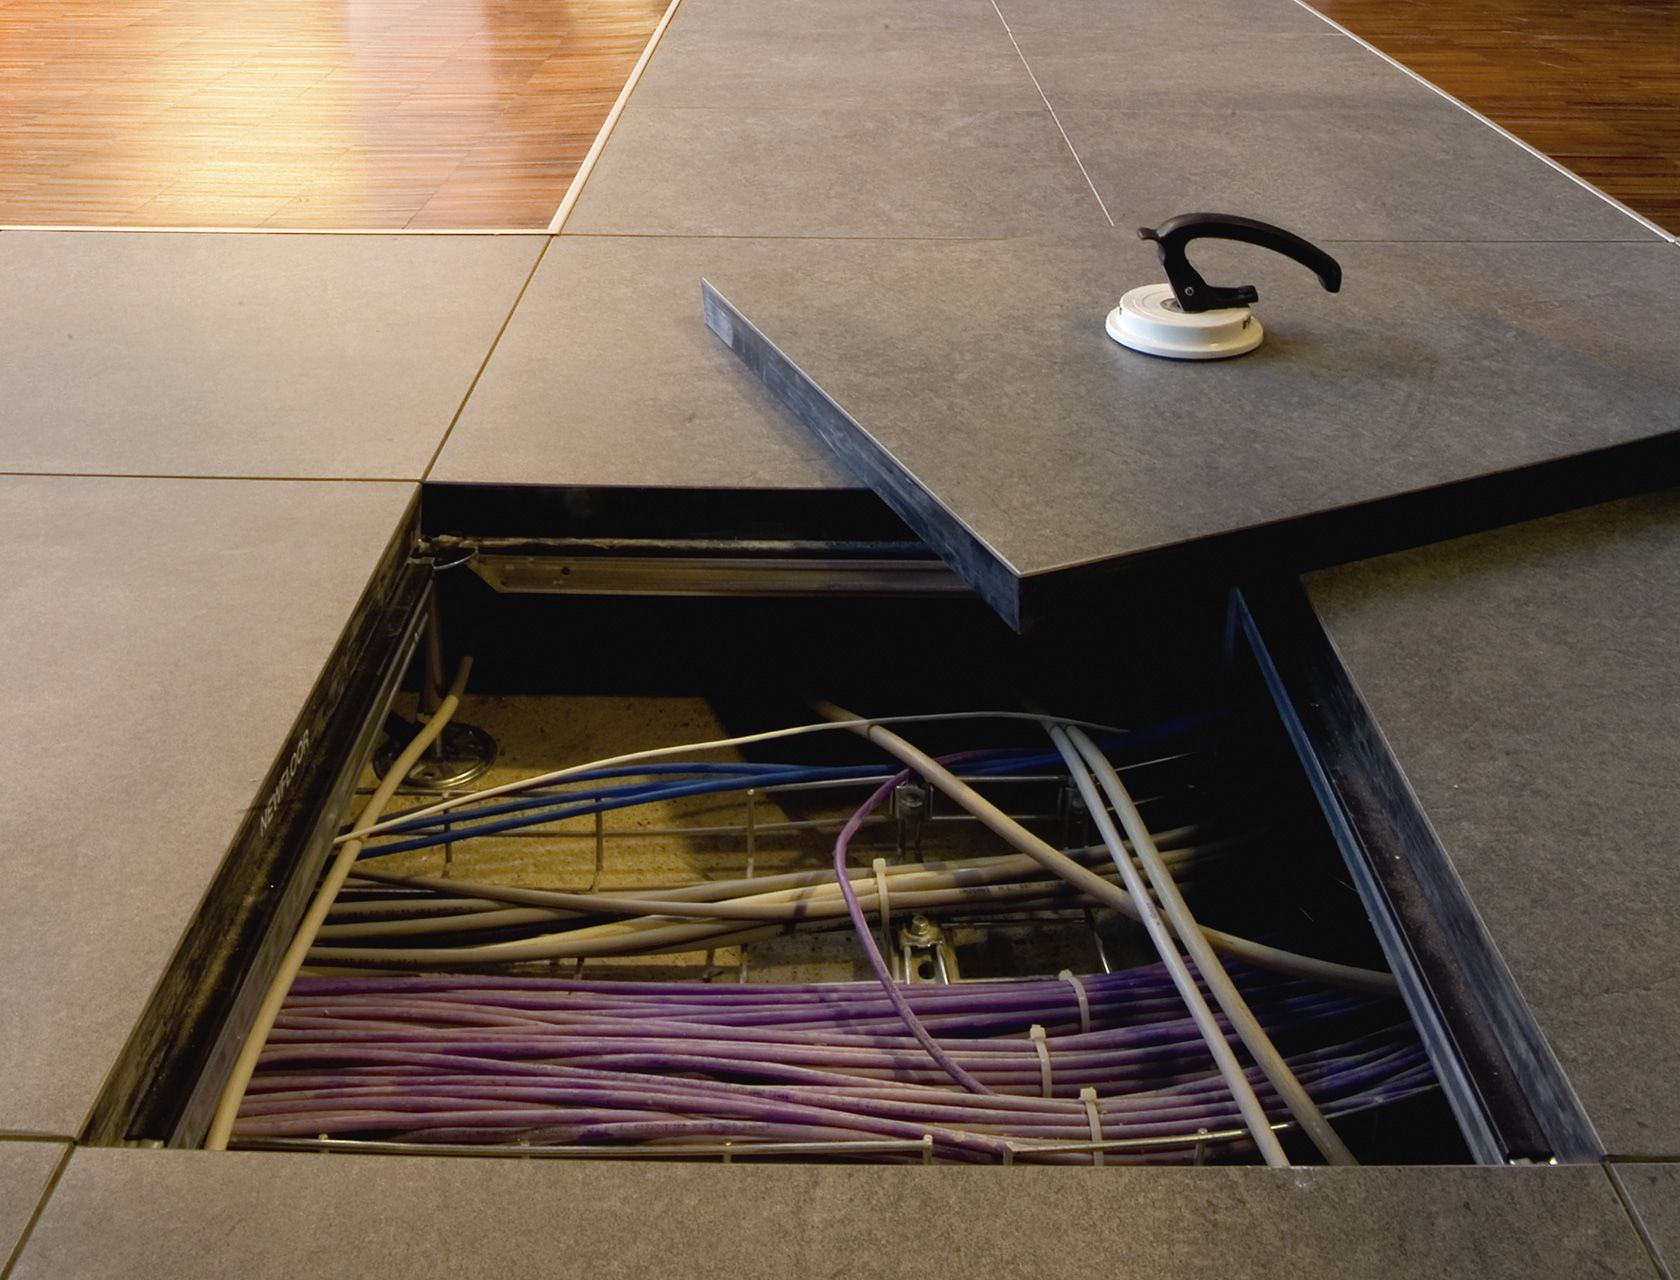 Pavimenti sopraelevati galleggianti pavimento libero da cavi